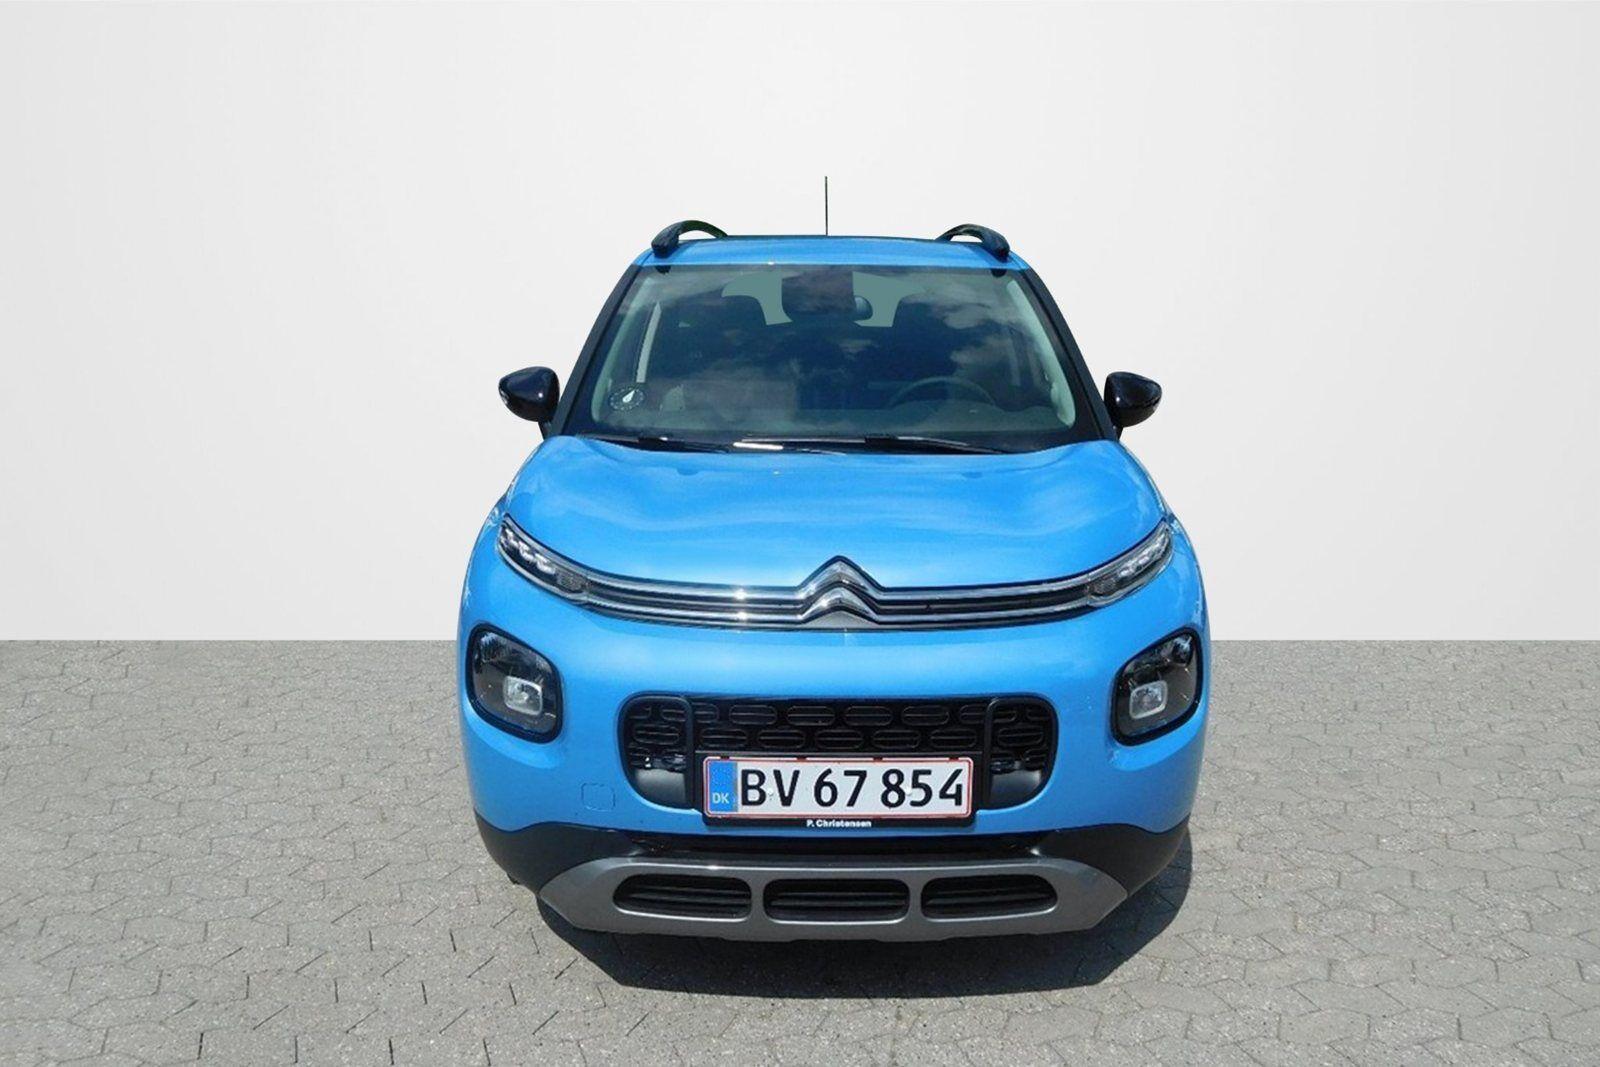 Citroën C3 Aircross 1,6 BlueHDi 100 Iconic 5d - 164.990 kr.